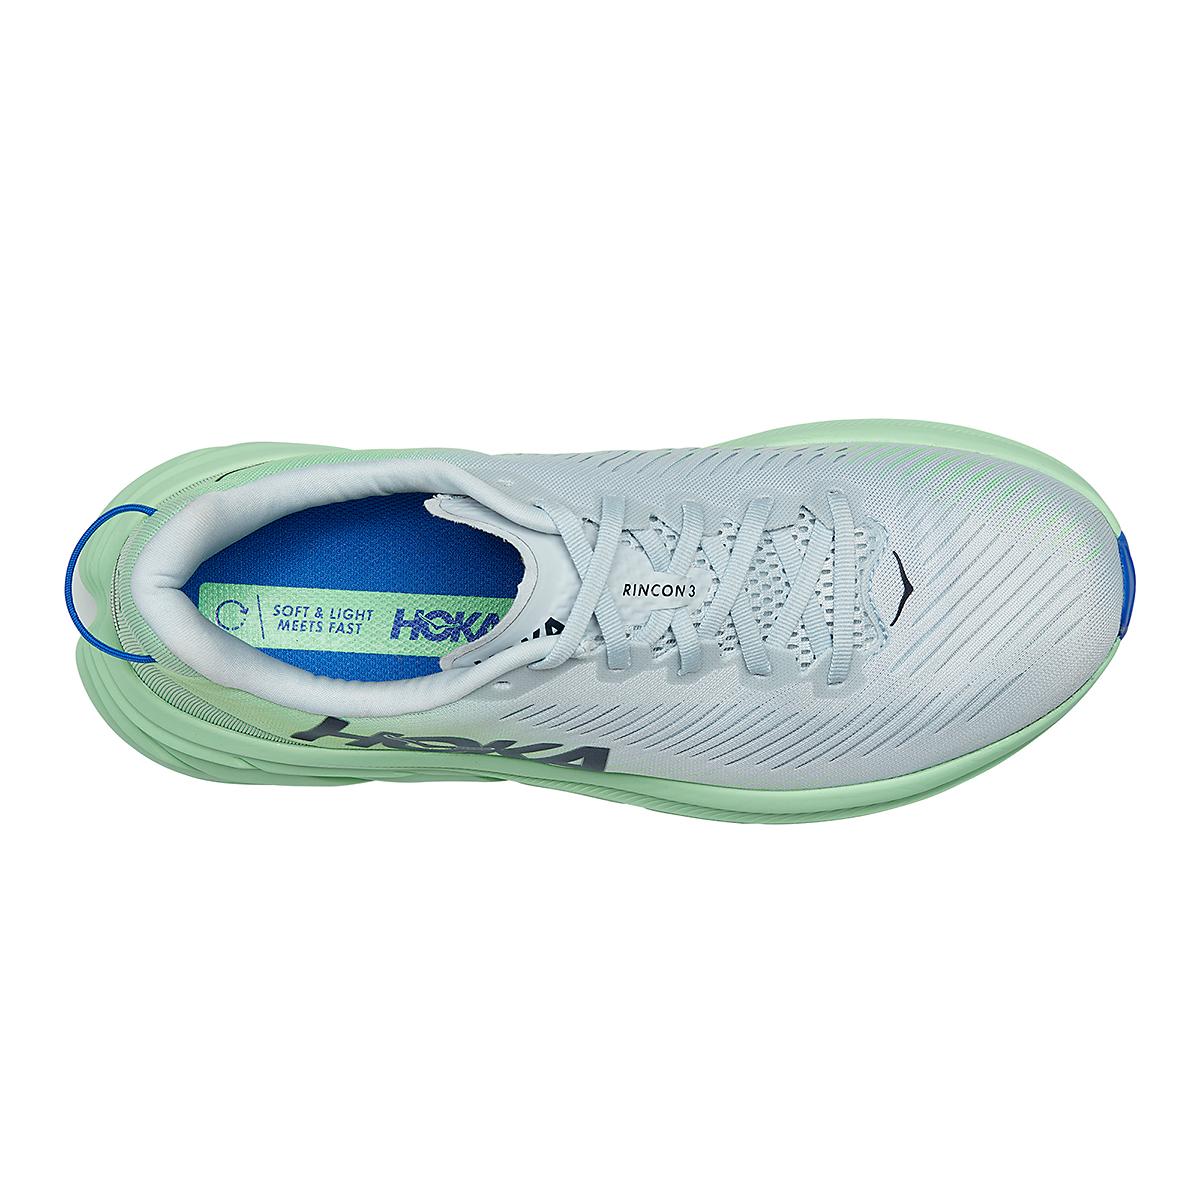 Men's Hoka One One Rincon 3 Running Shoe - Color: Plein Air/Green Ash - Size: 7 - Width: Regular, Plein Air/Green Ash, large, image 5